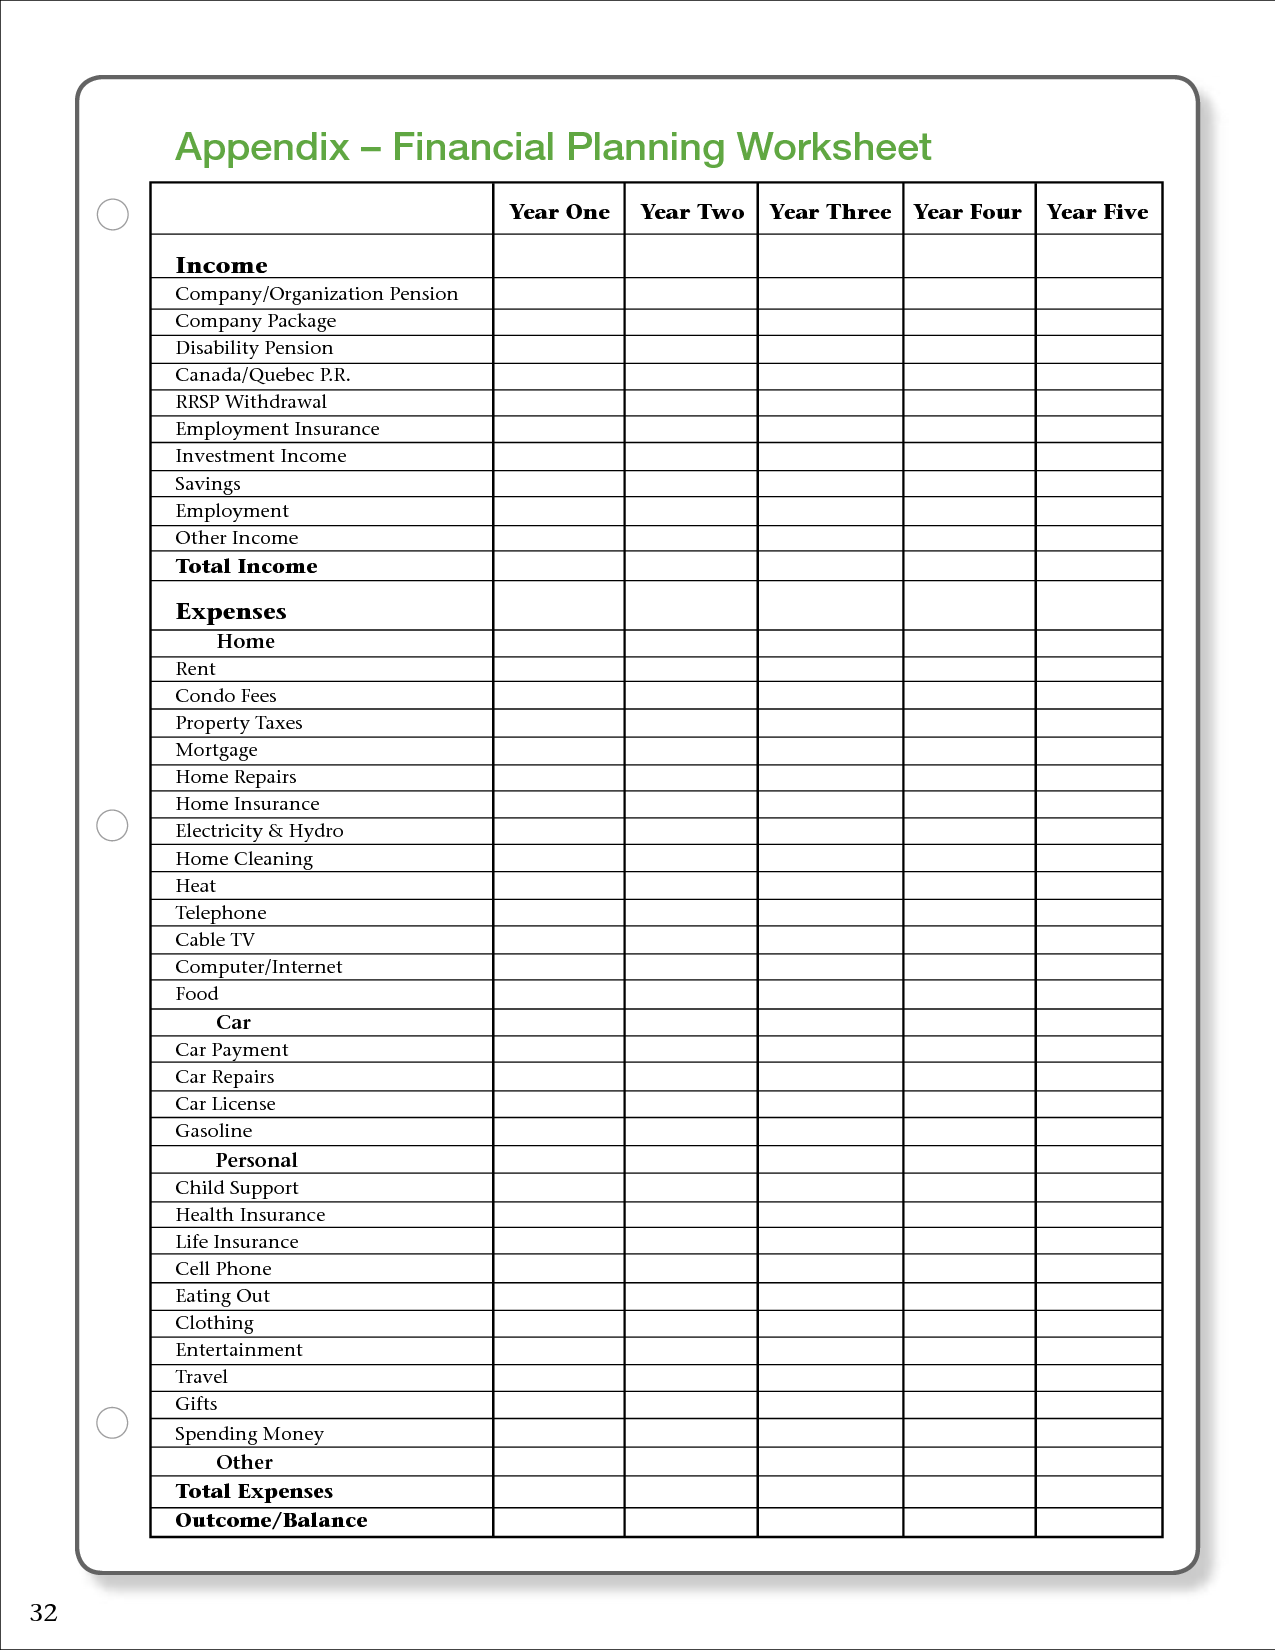 Worksheets Financial Plan Worksheet Cheatslist Free Worksheets For Kids Amp Printable